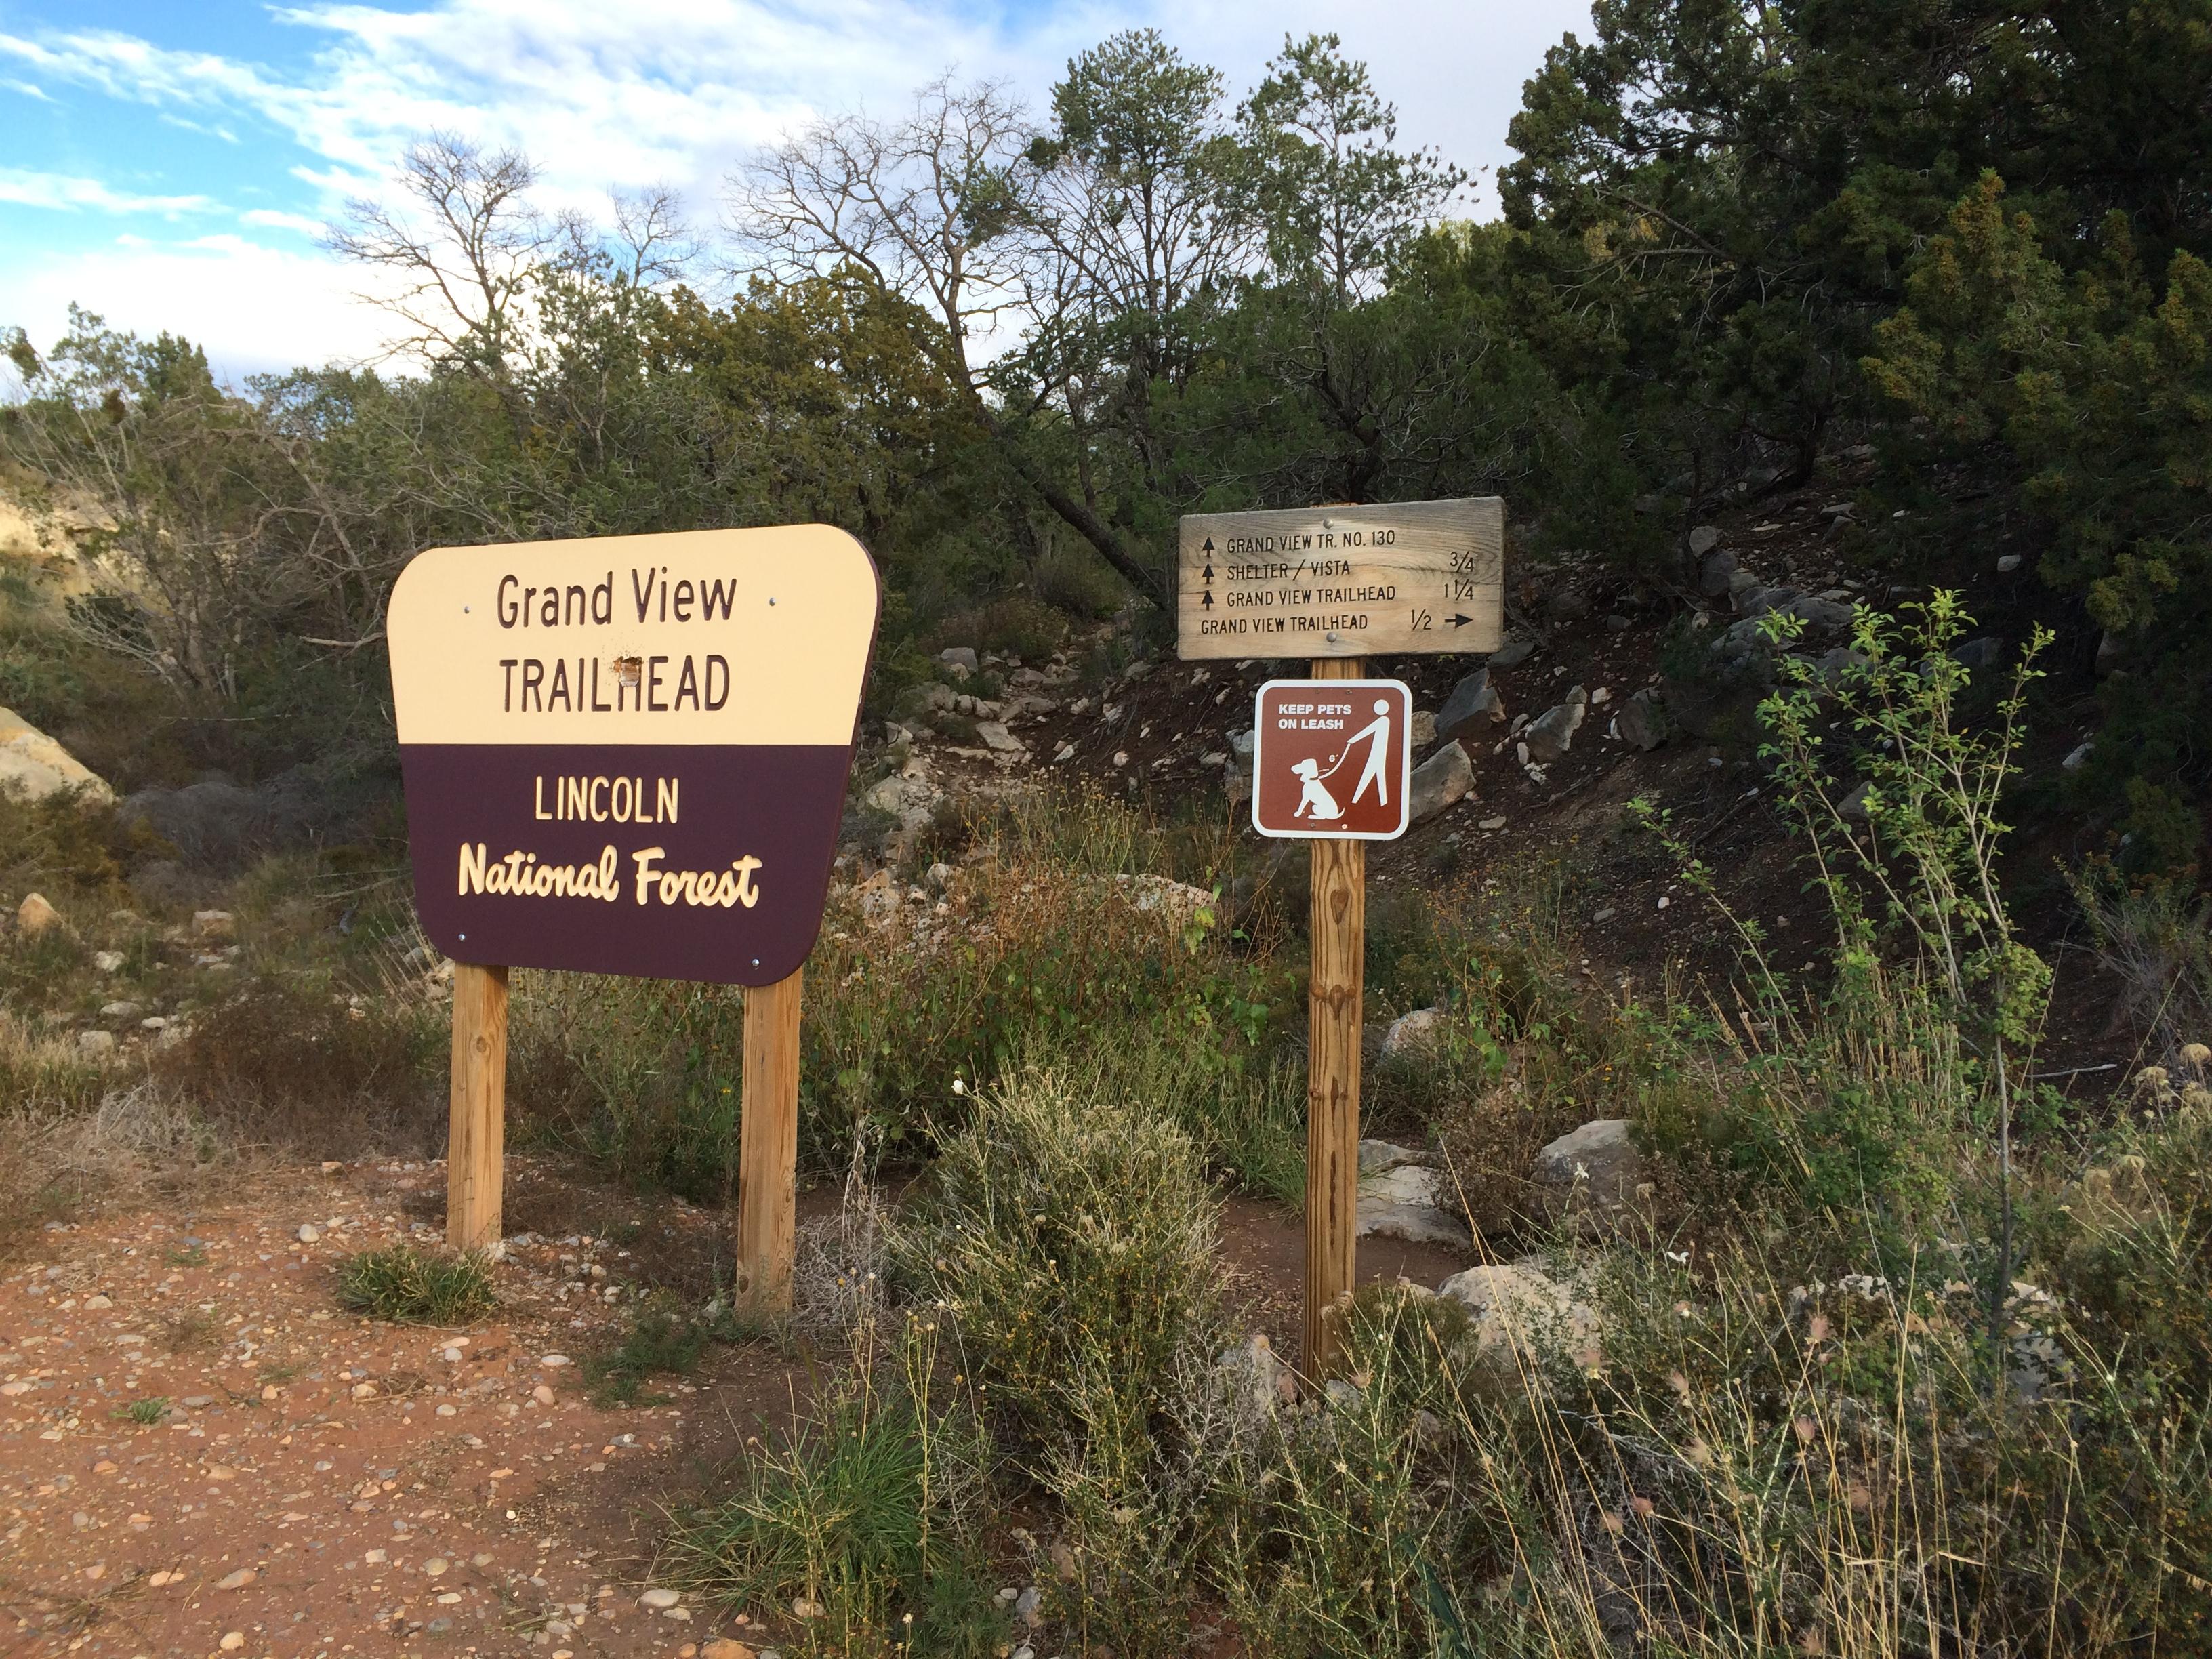 grandview-trail-sign